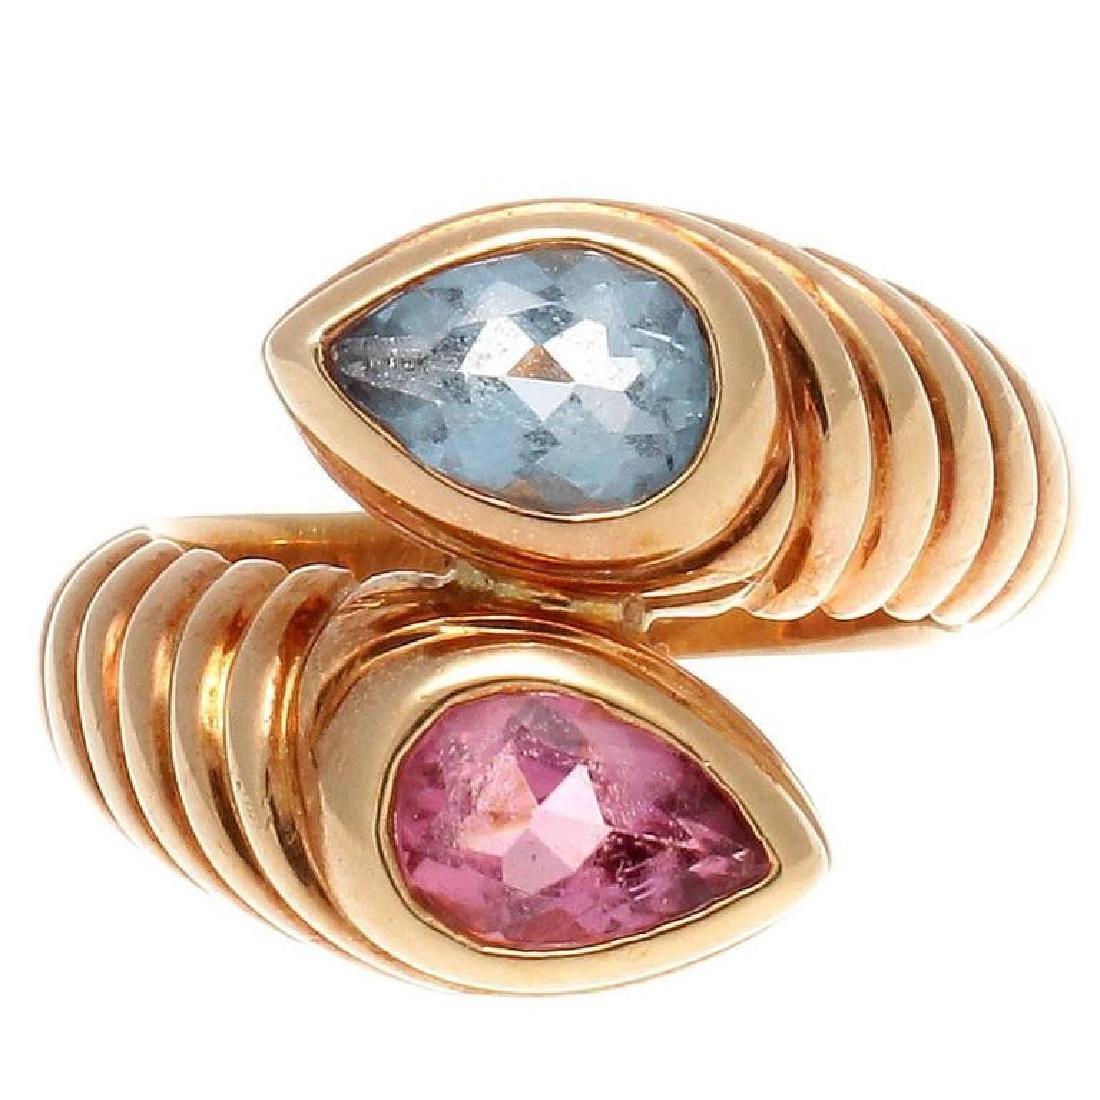 Bulgari 18K Gold TopazTourmaline Snake Ring